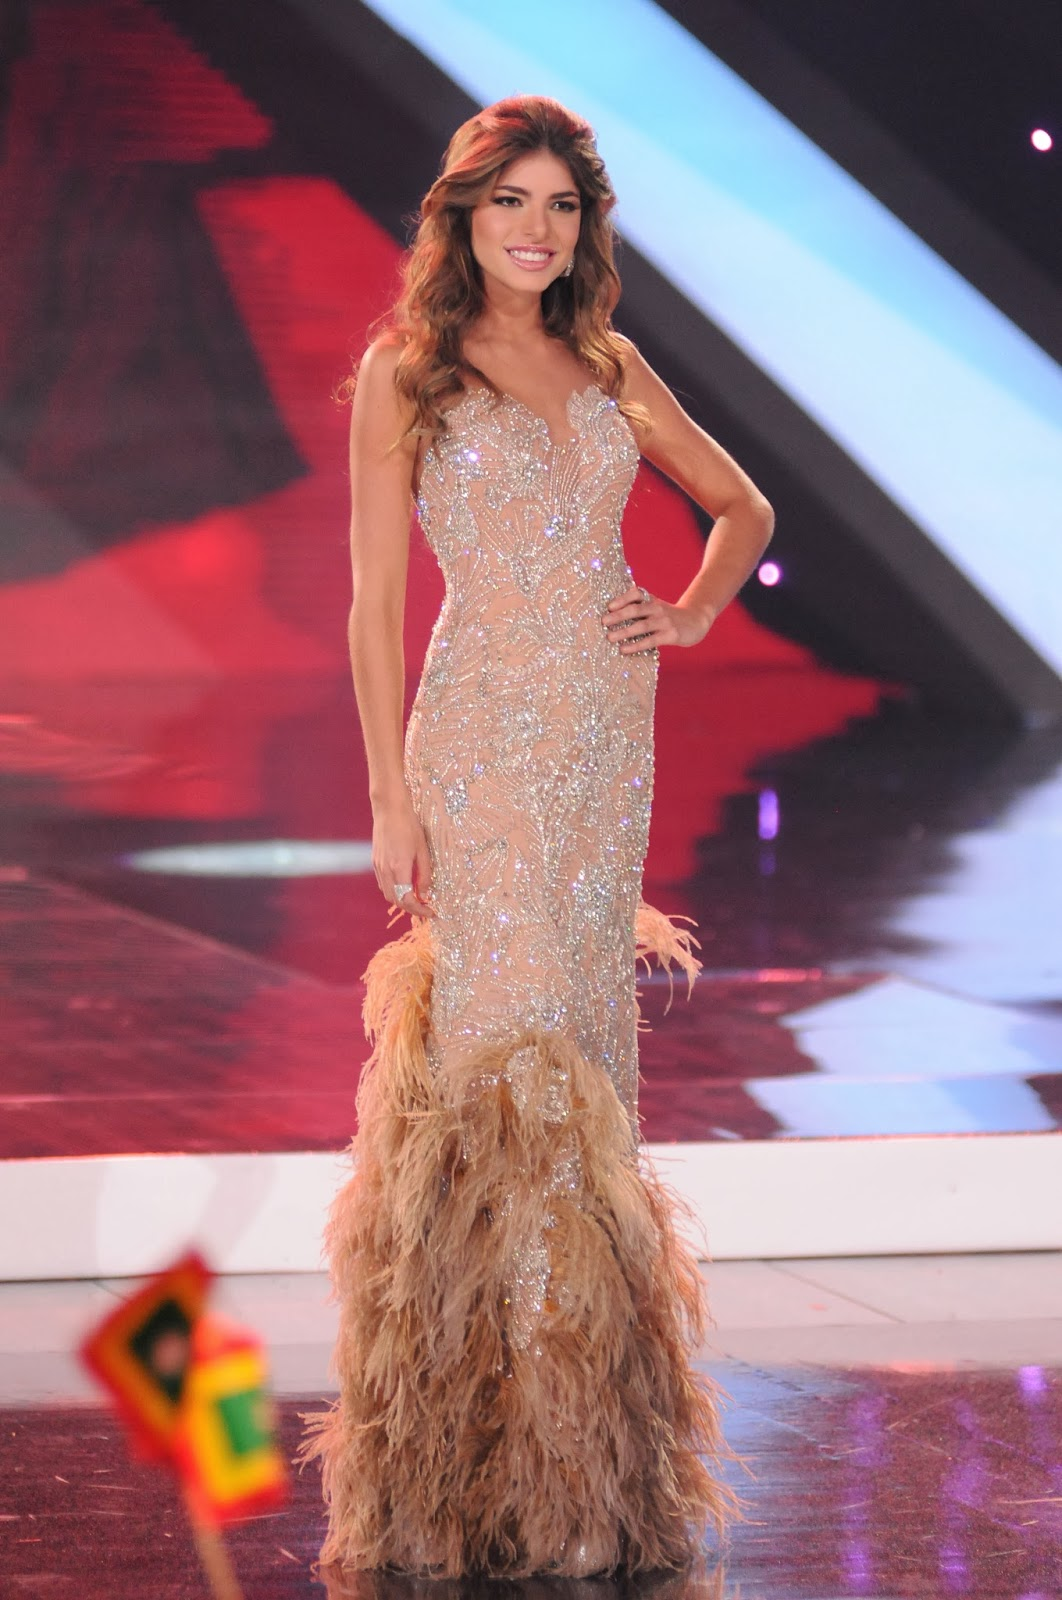 noviembre 2013 - Moda 2.0: Blog de moda colombiano